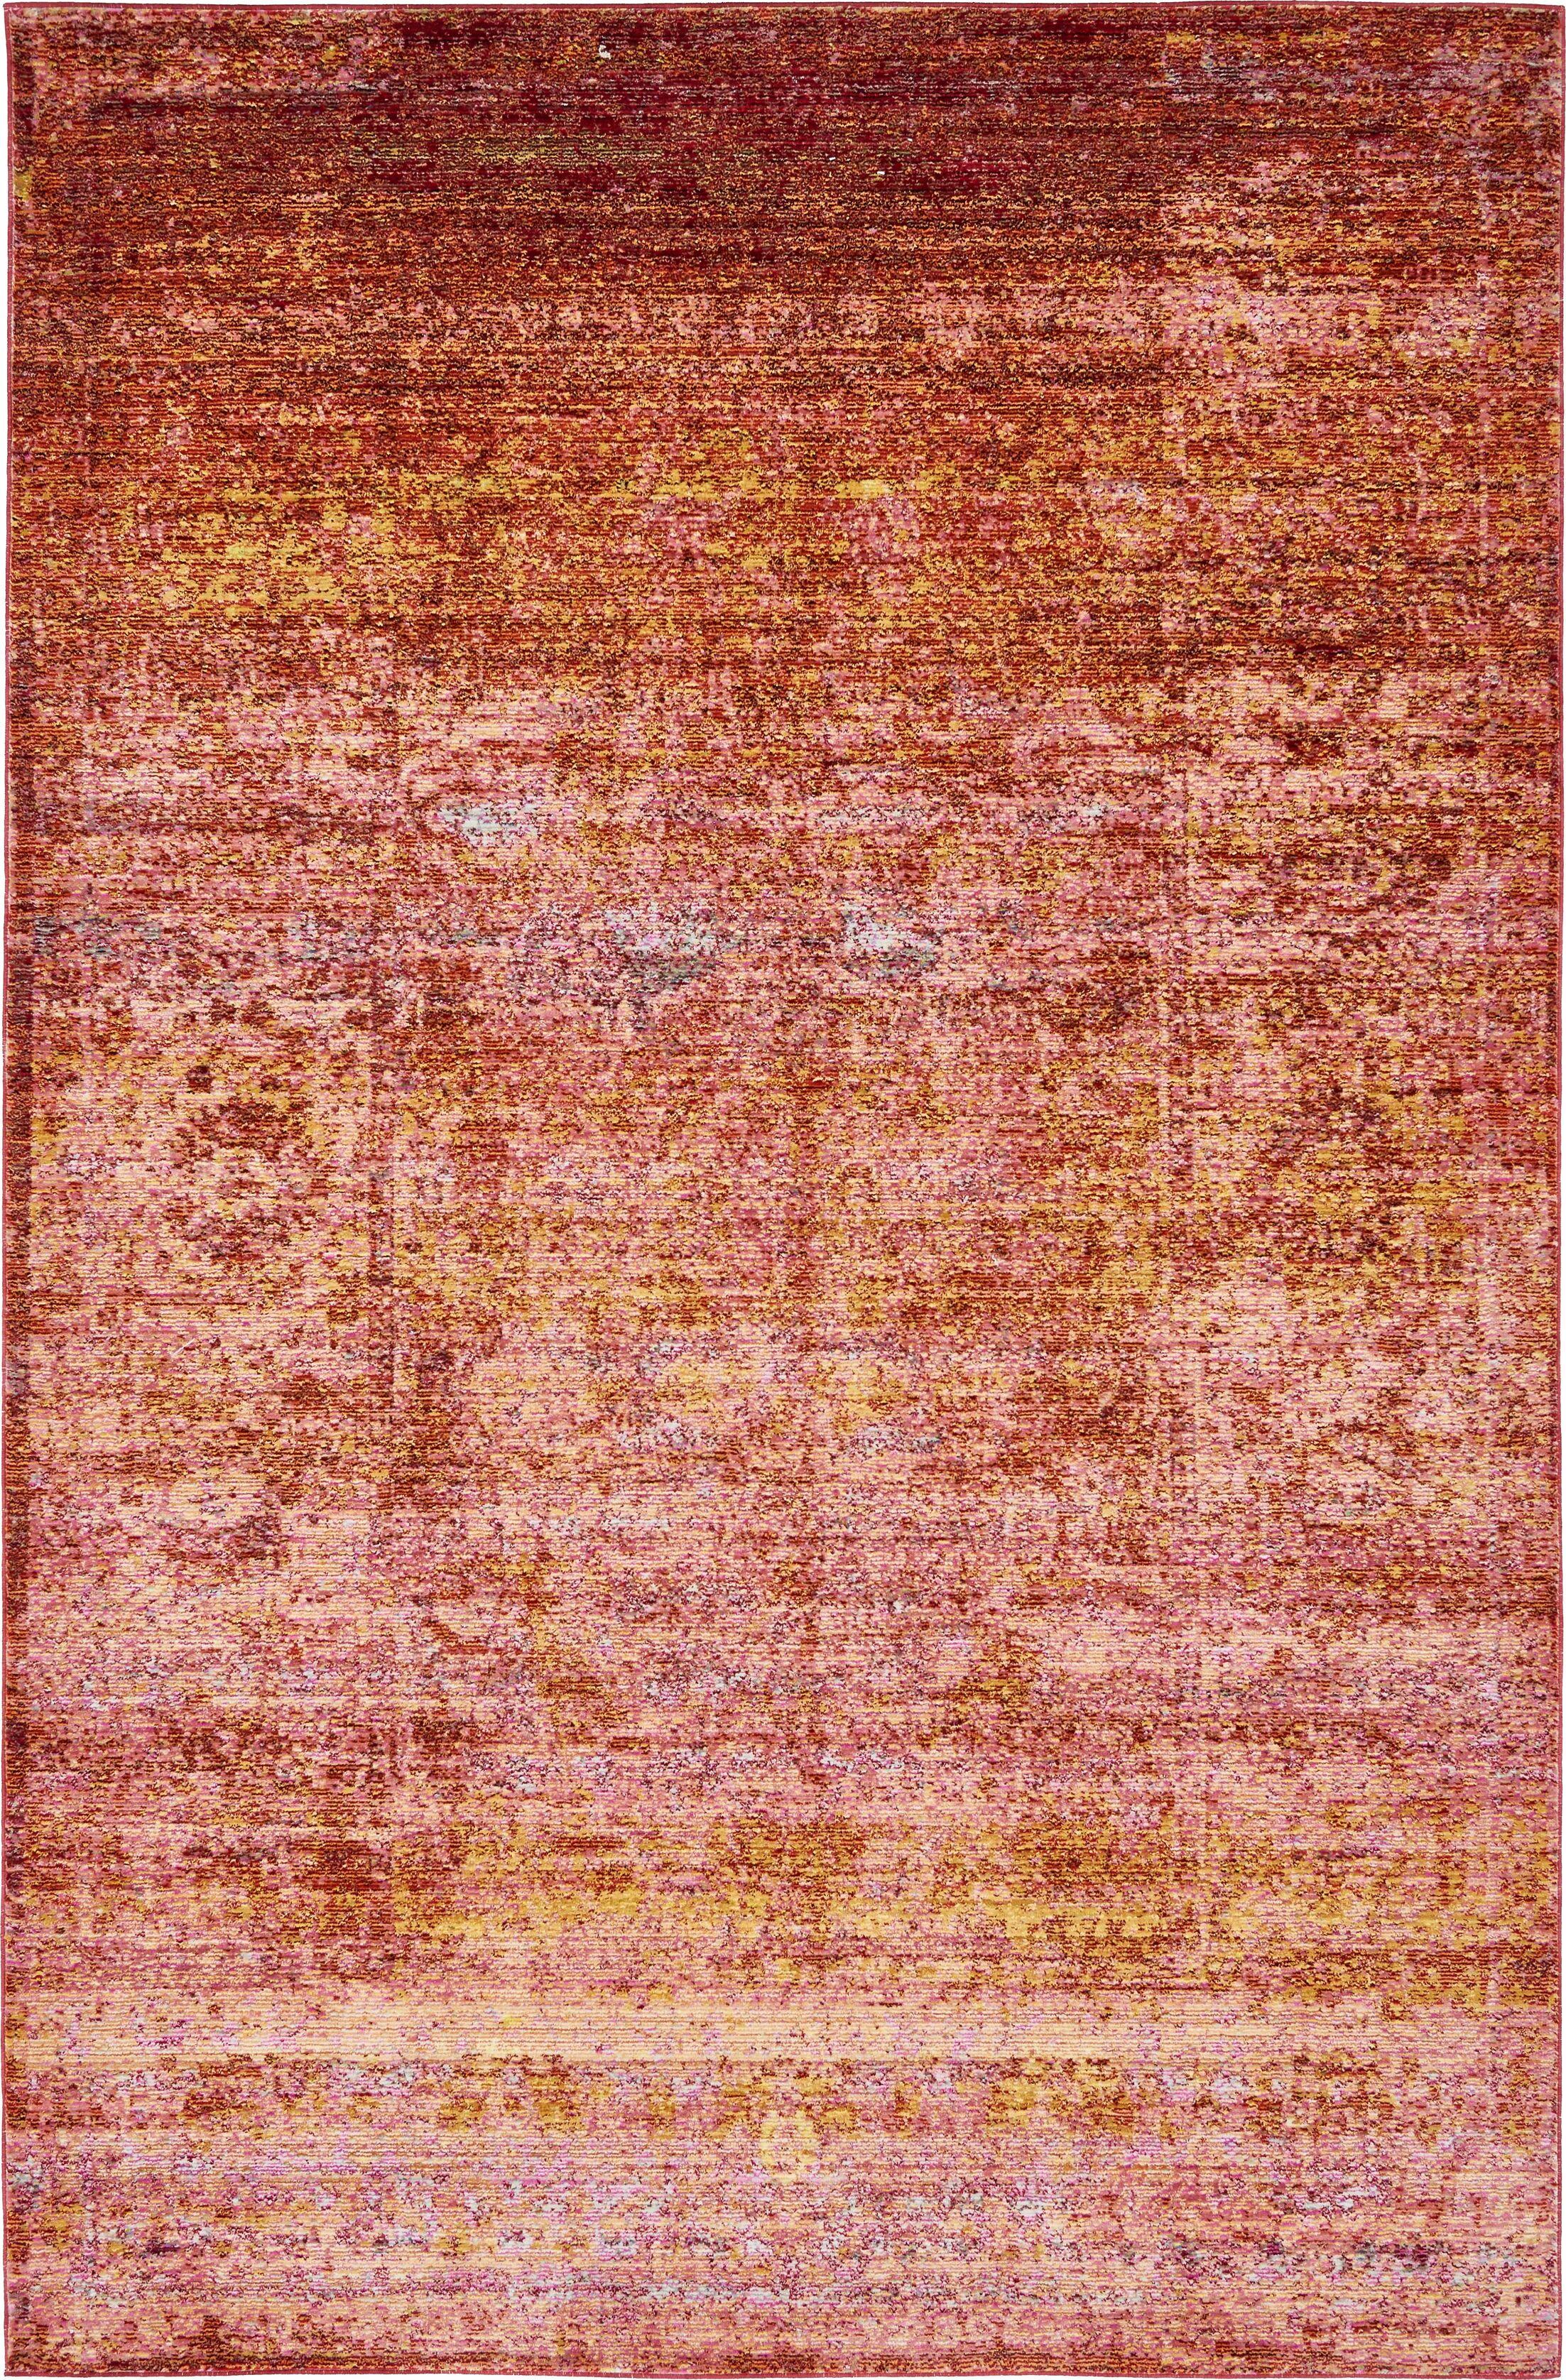 Browne Orange Area Rug Rug Size: Rectangle 5' x 8'